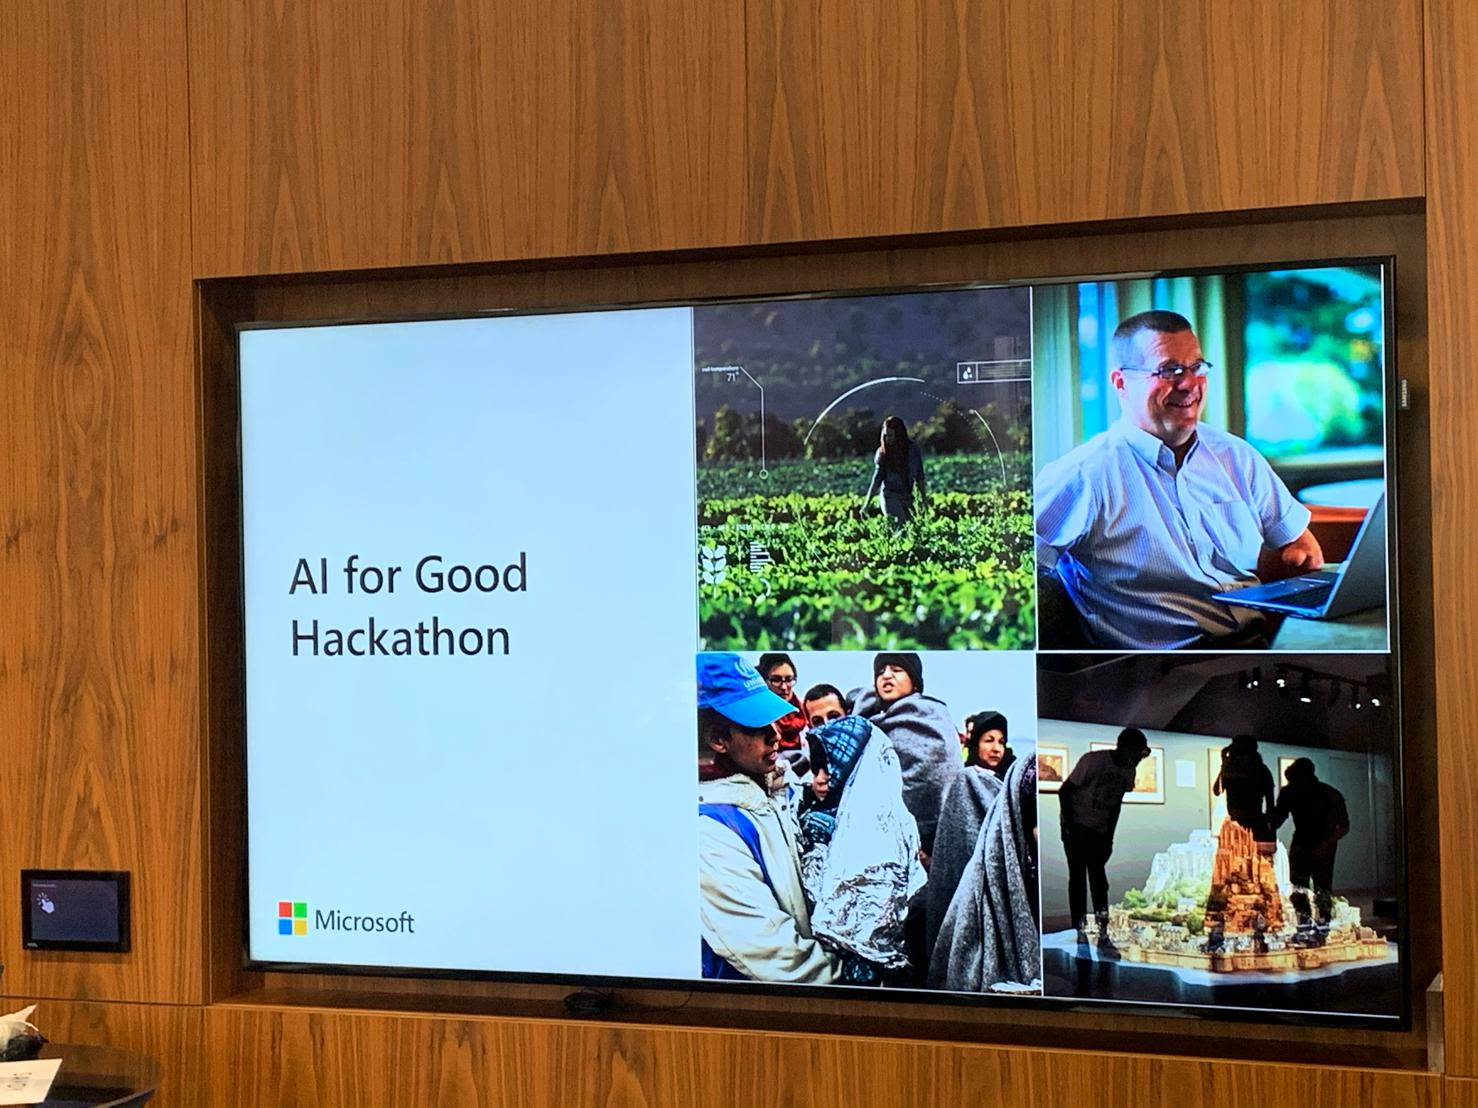 AI for Good Hackathon